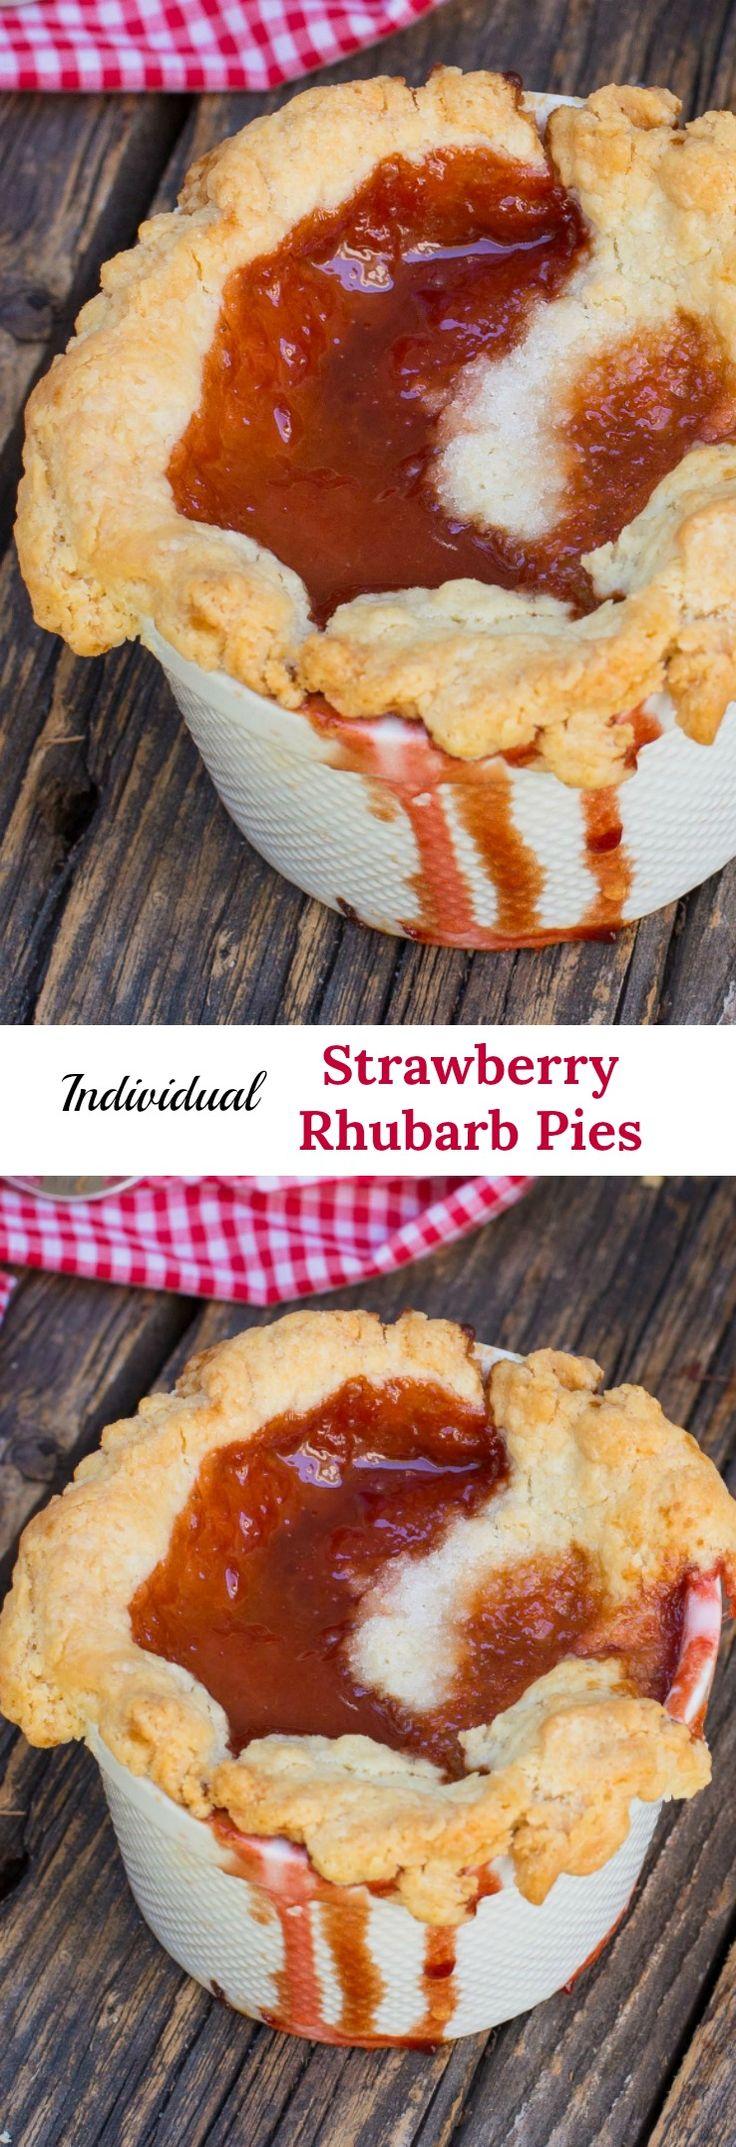 Strawberry Rhubarb Pie combine the tart flavour of rhubarb and sweet strawberries in a ultra flaky homemade pie crust.#strawberryrhubarbpie#rhubarbpie#strawberrypie